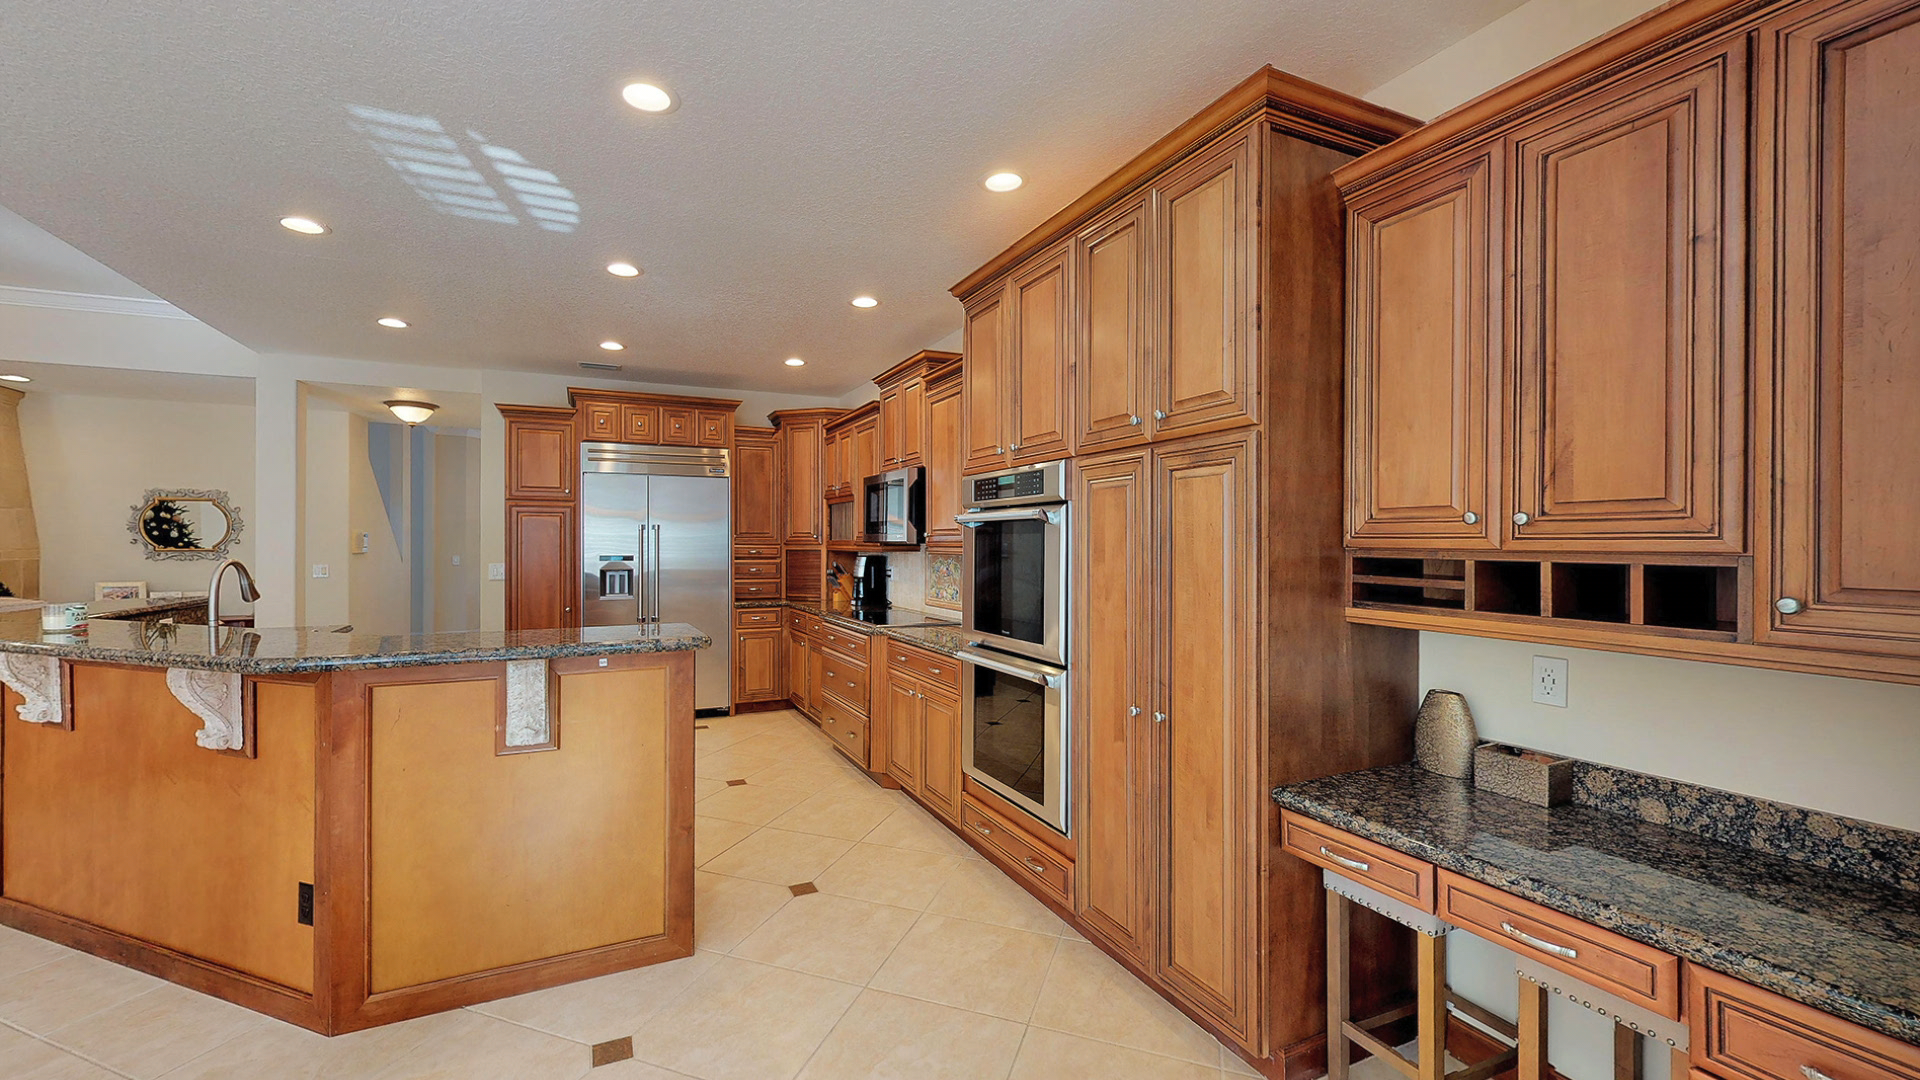 2987 Cypress Ct Kitchen.png